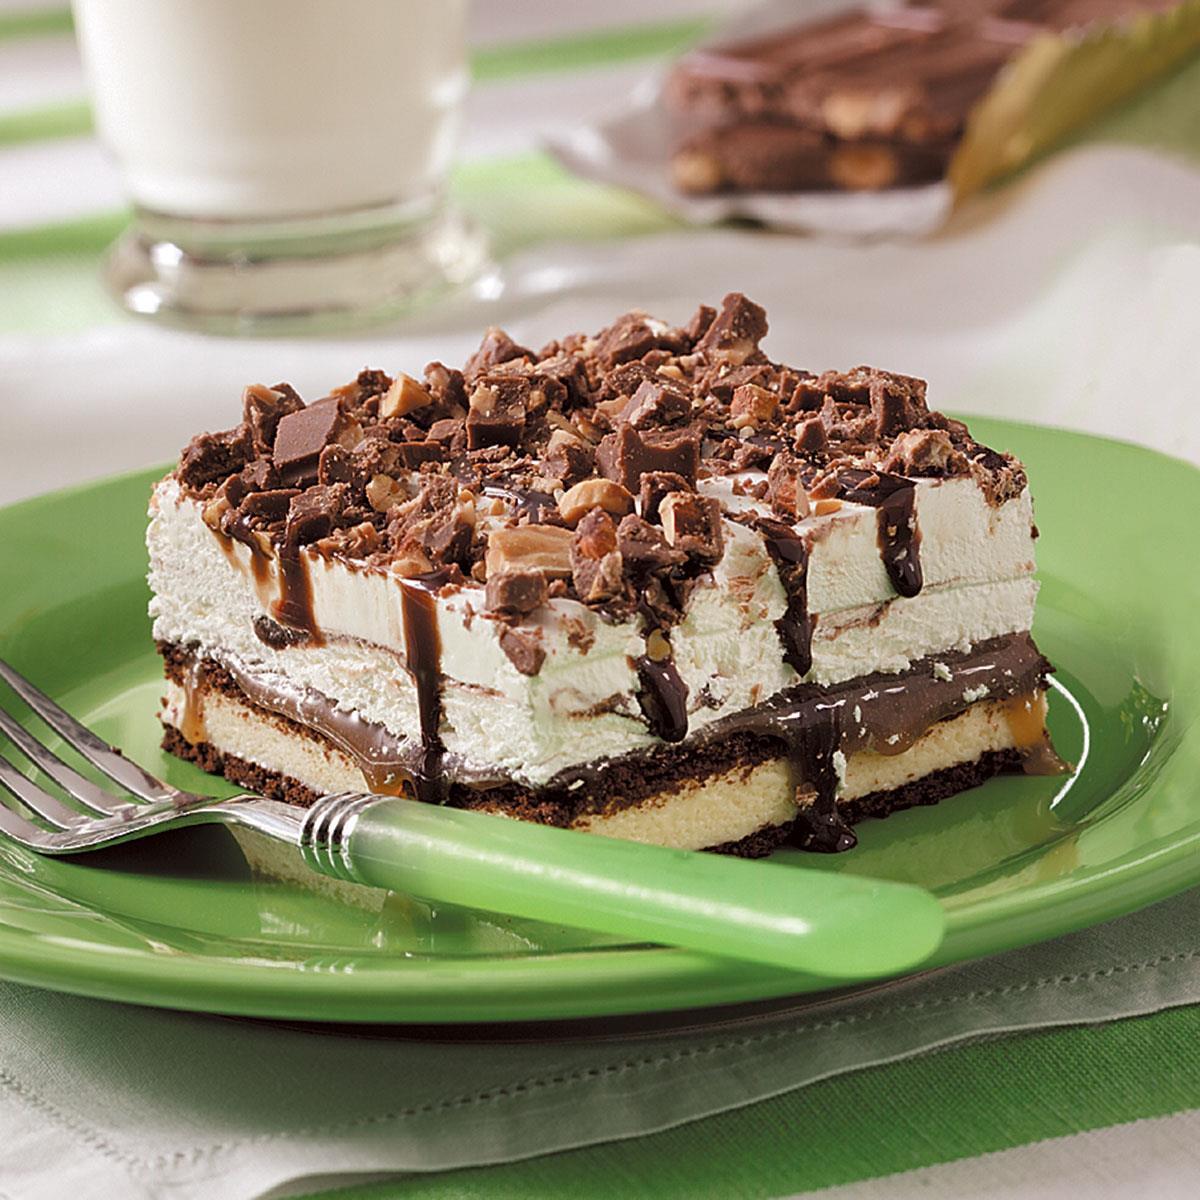 Best Easy Dessert Recipes  Easy Ice Cream Sandwich Dessert Recipe